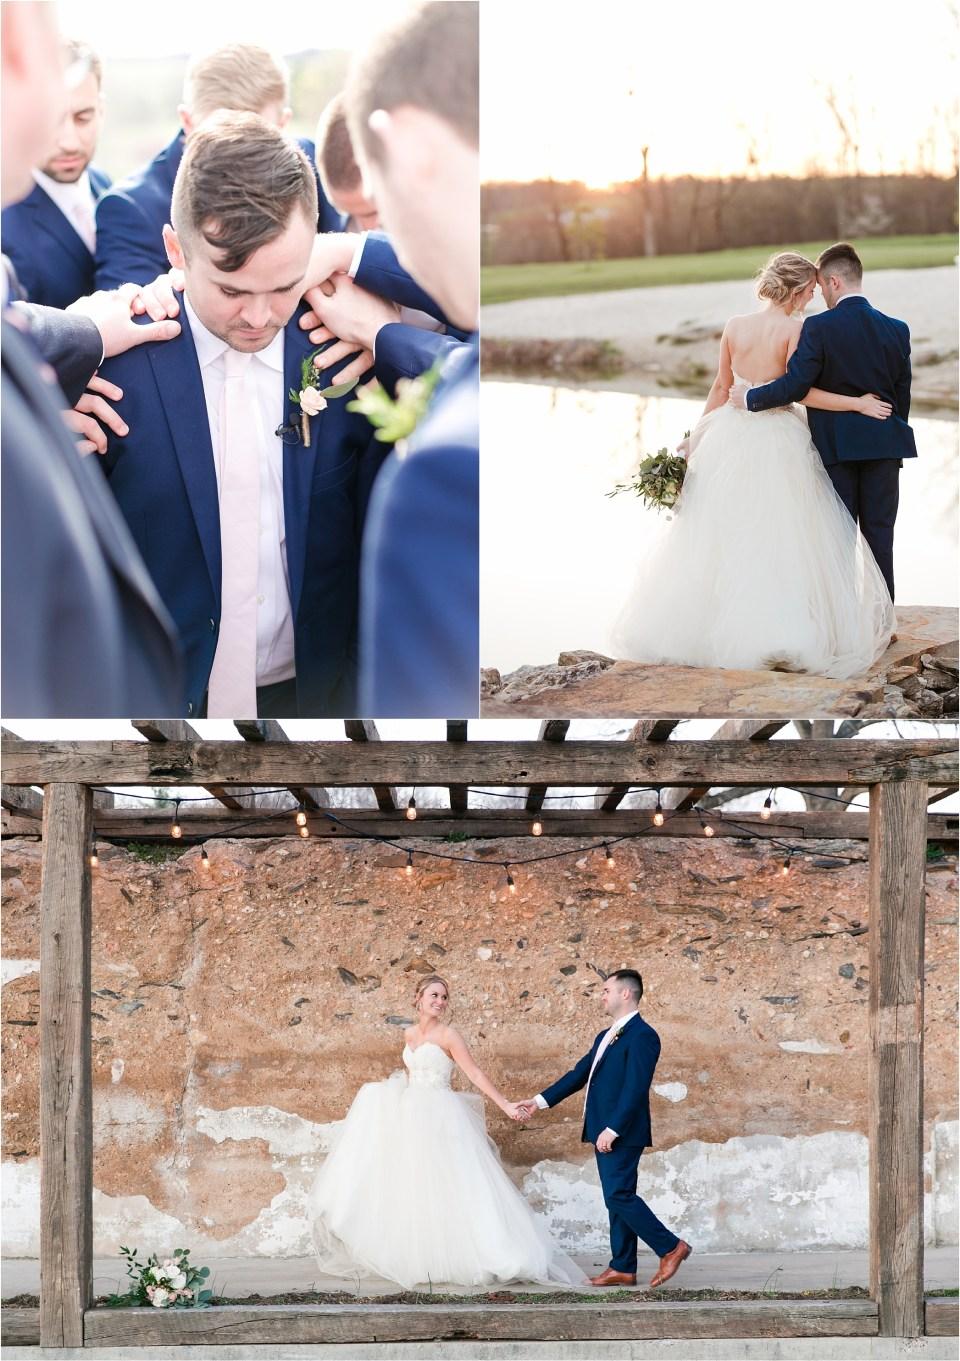 Best of 2017 Weddings Maryland Photographer